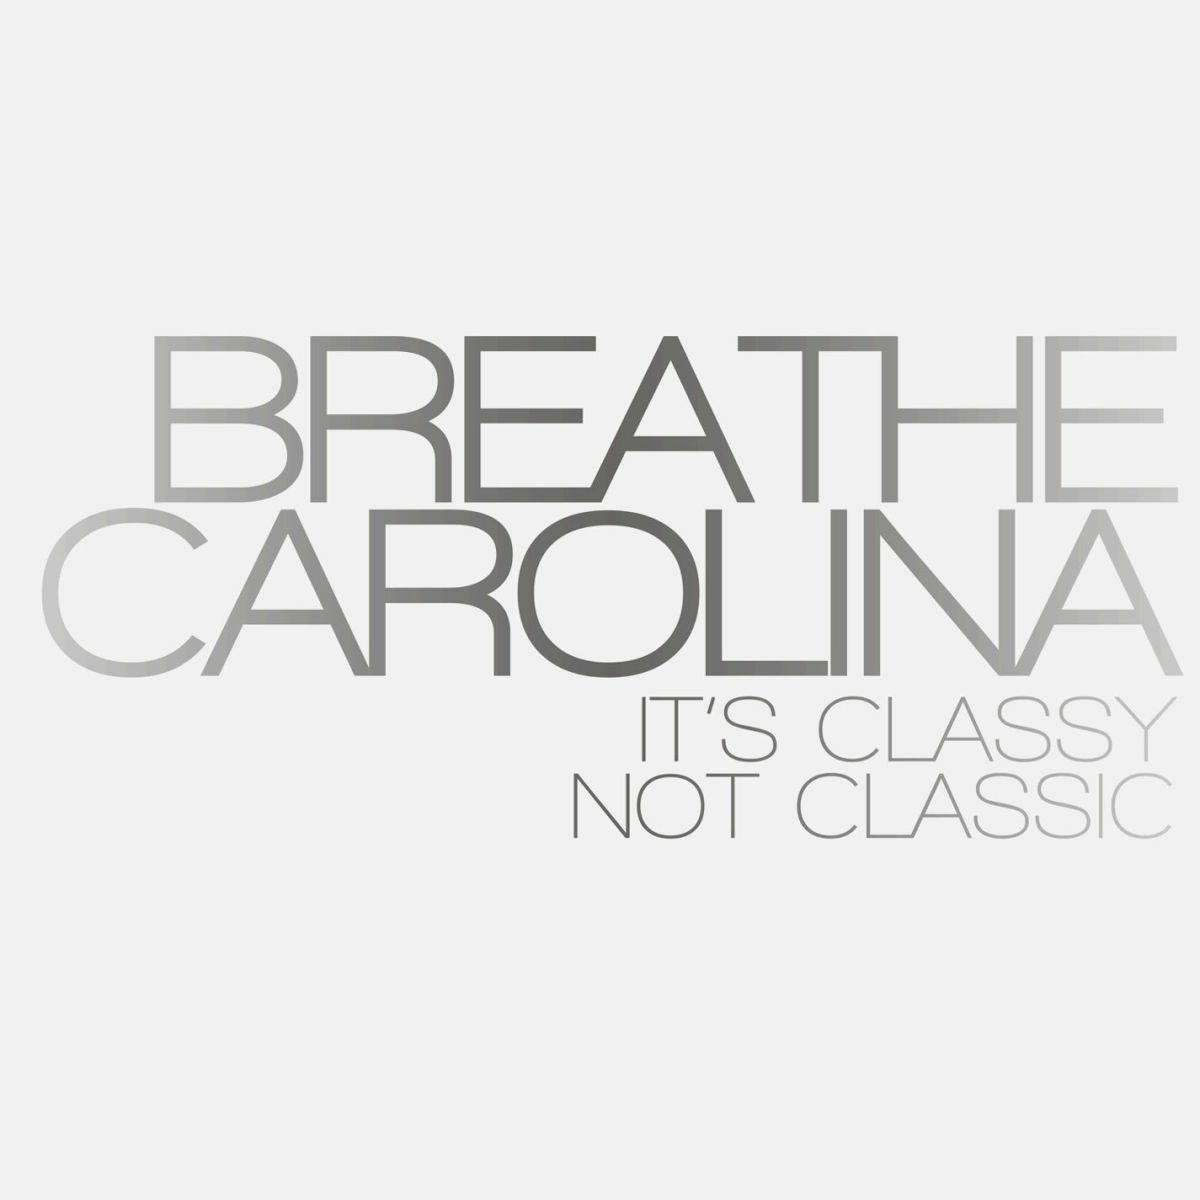 Breathe Carolina - It's Classy, Not Classic (2008)